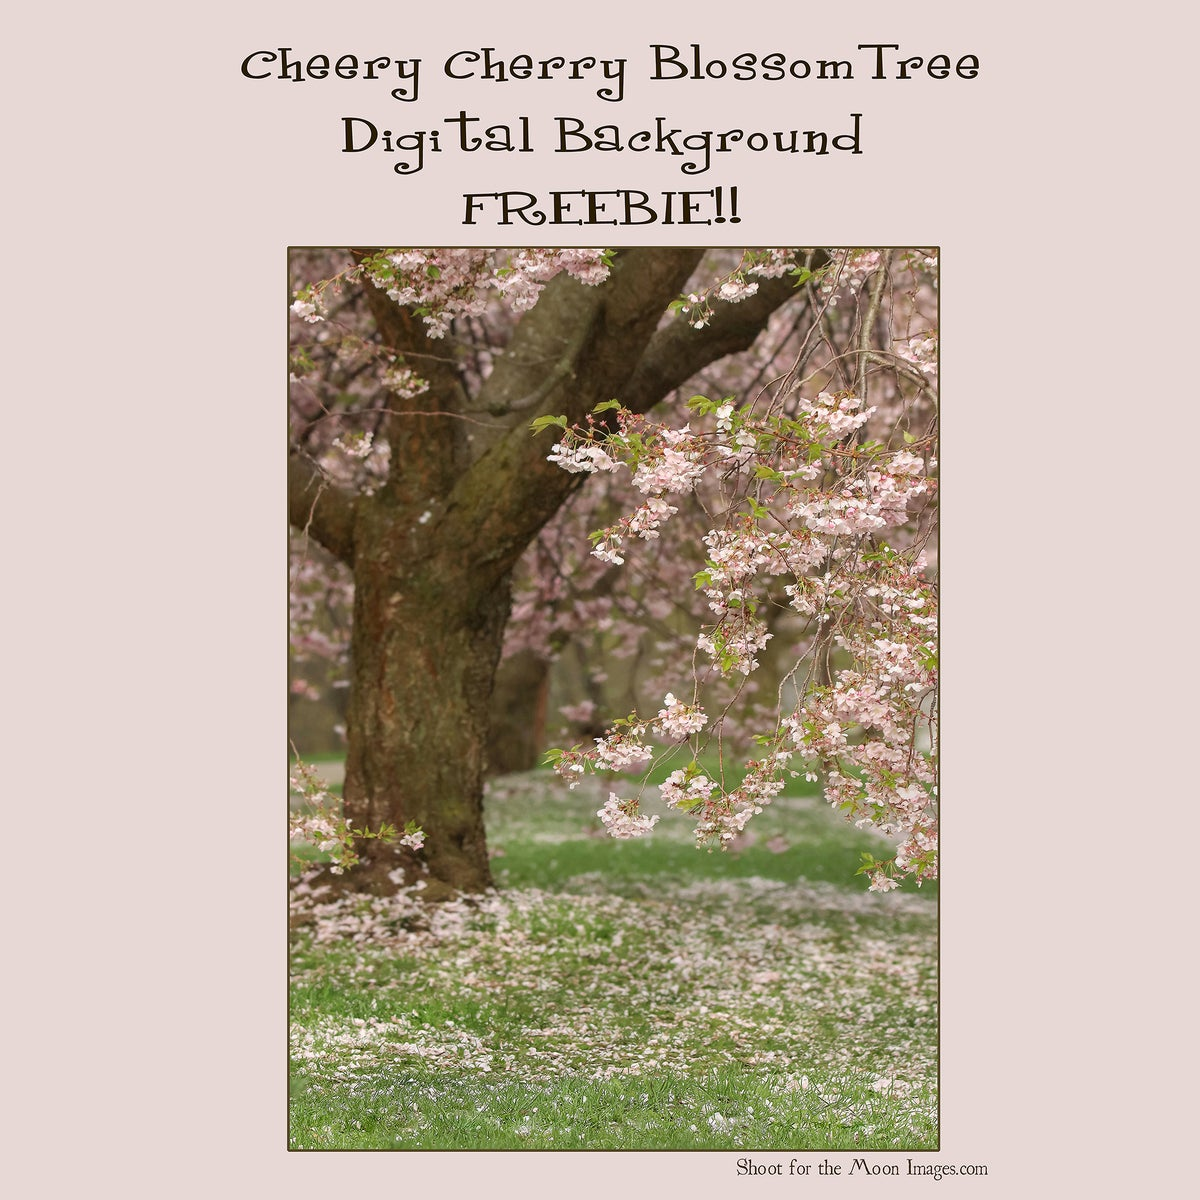 Image of Cheery Cherry Blossom Tree FREEBIE